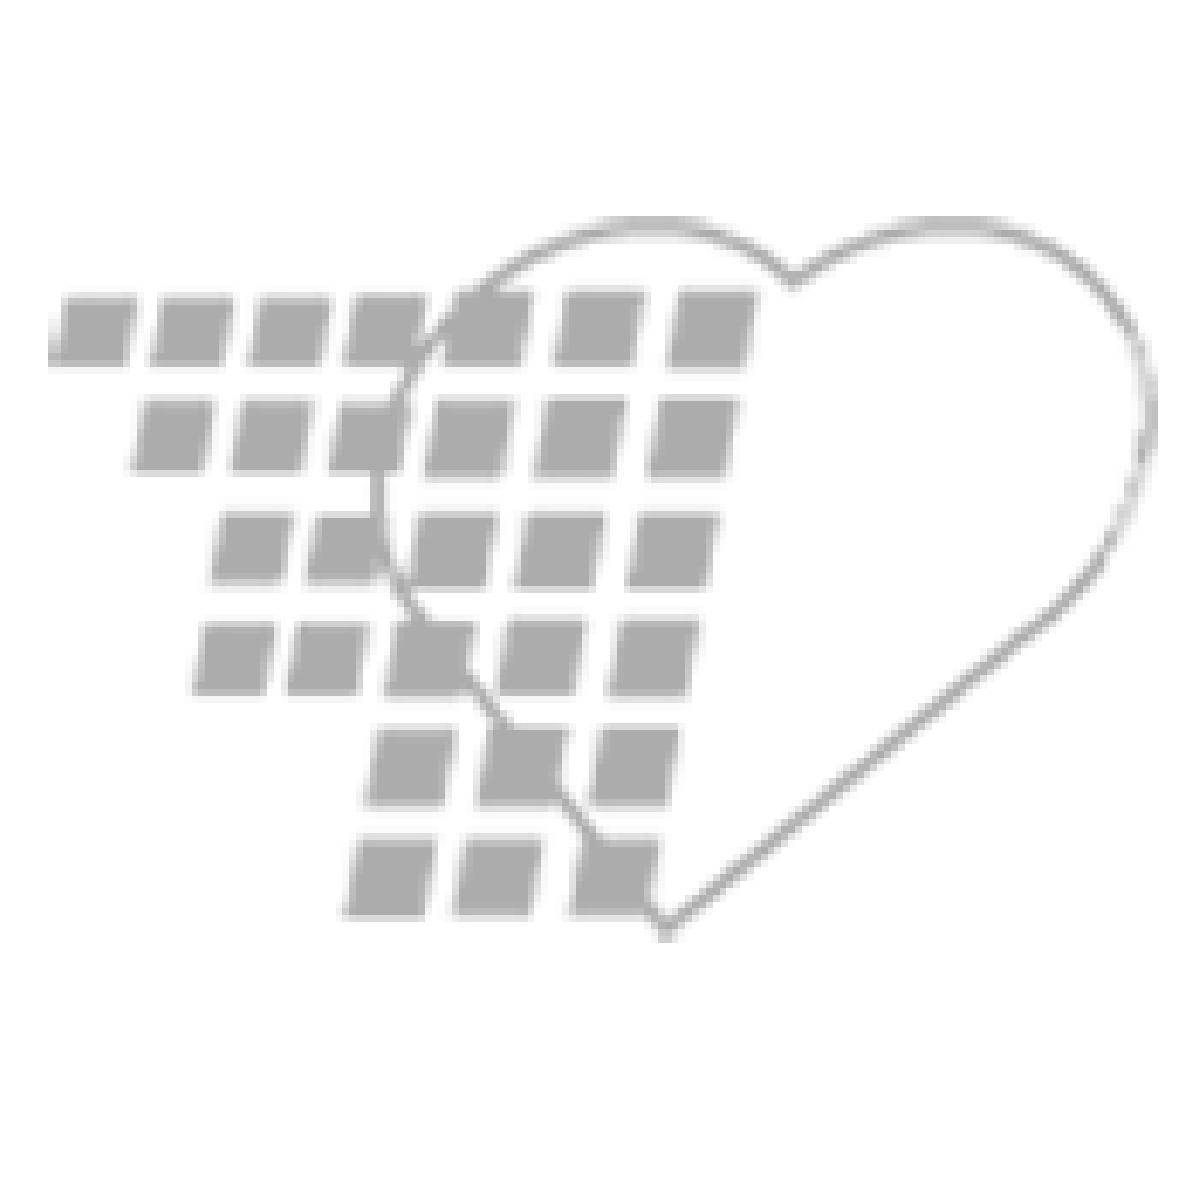 06-93-0046 - Demo Dose® Glucophag 500 mg - 100 Pills/Box